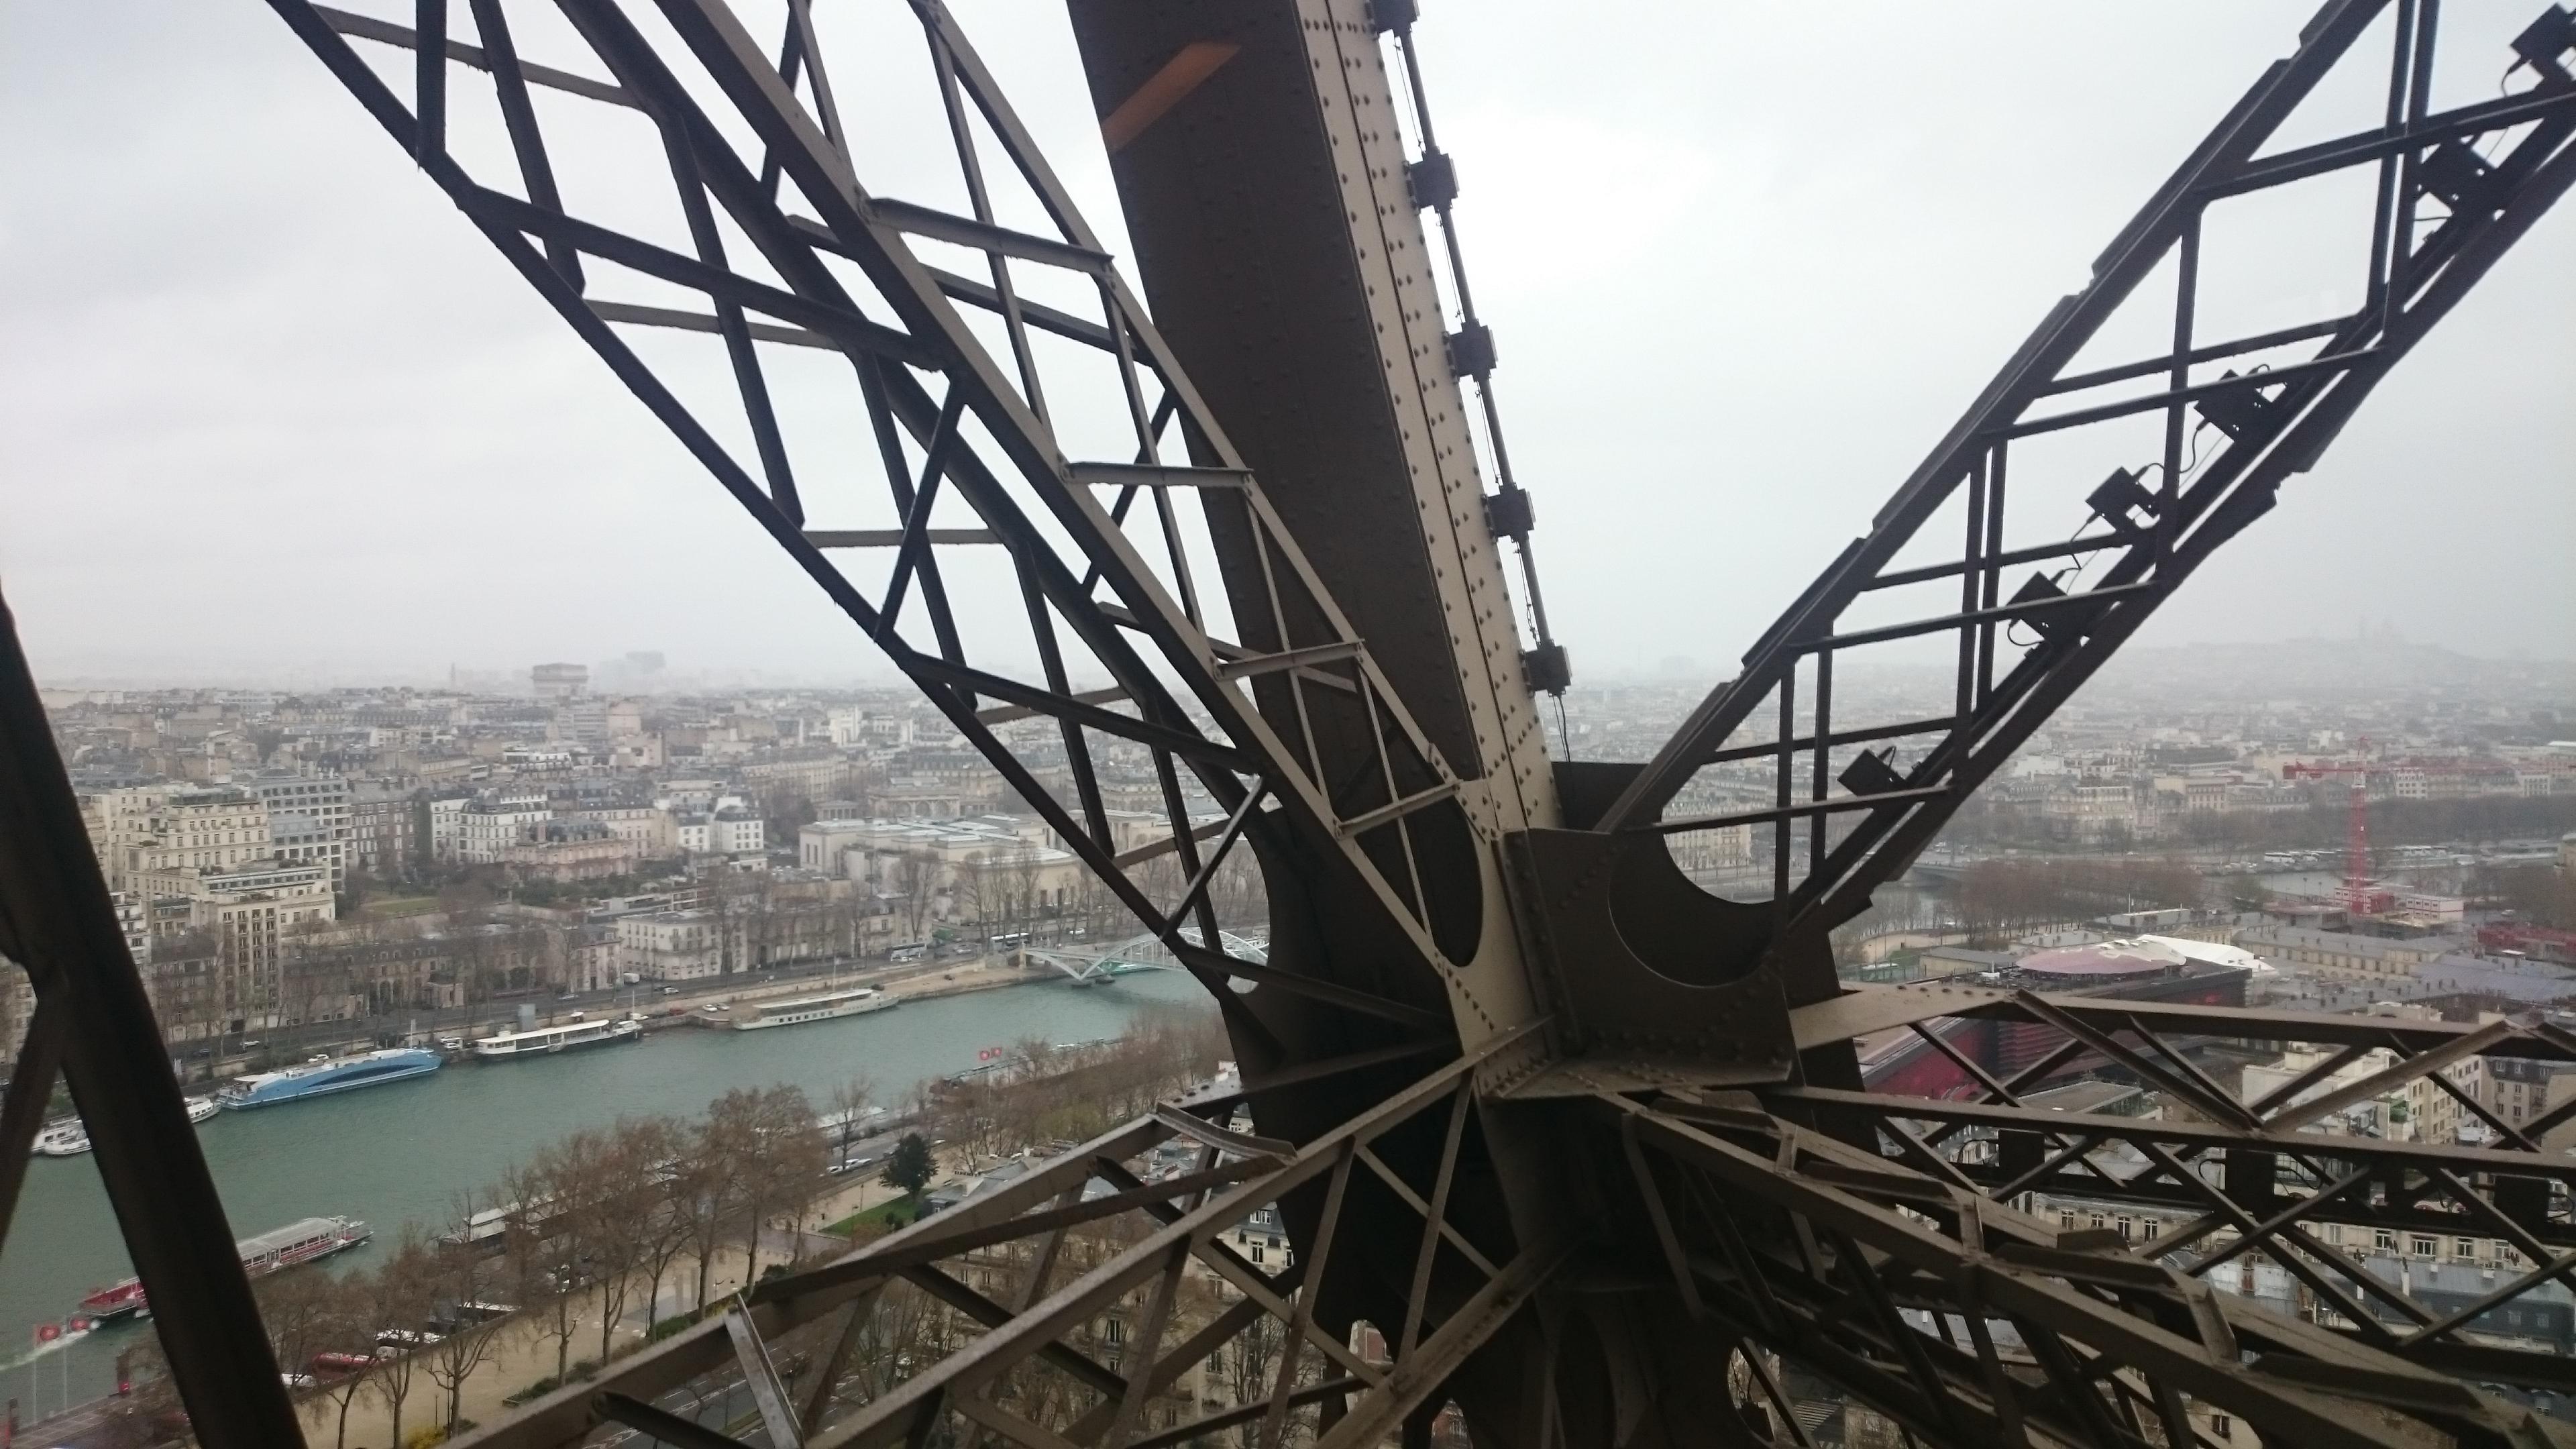 DSC 1904 - Visitando la Torre Eiffel en Paris